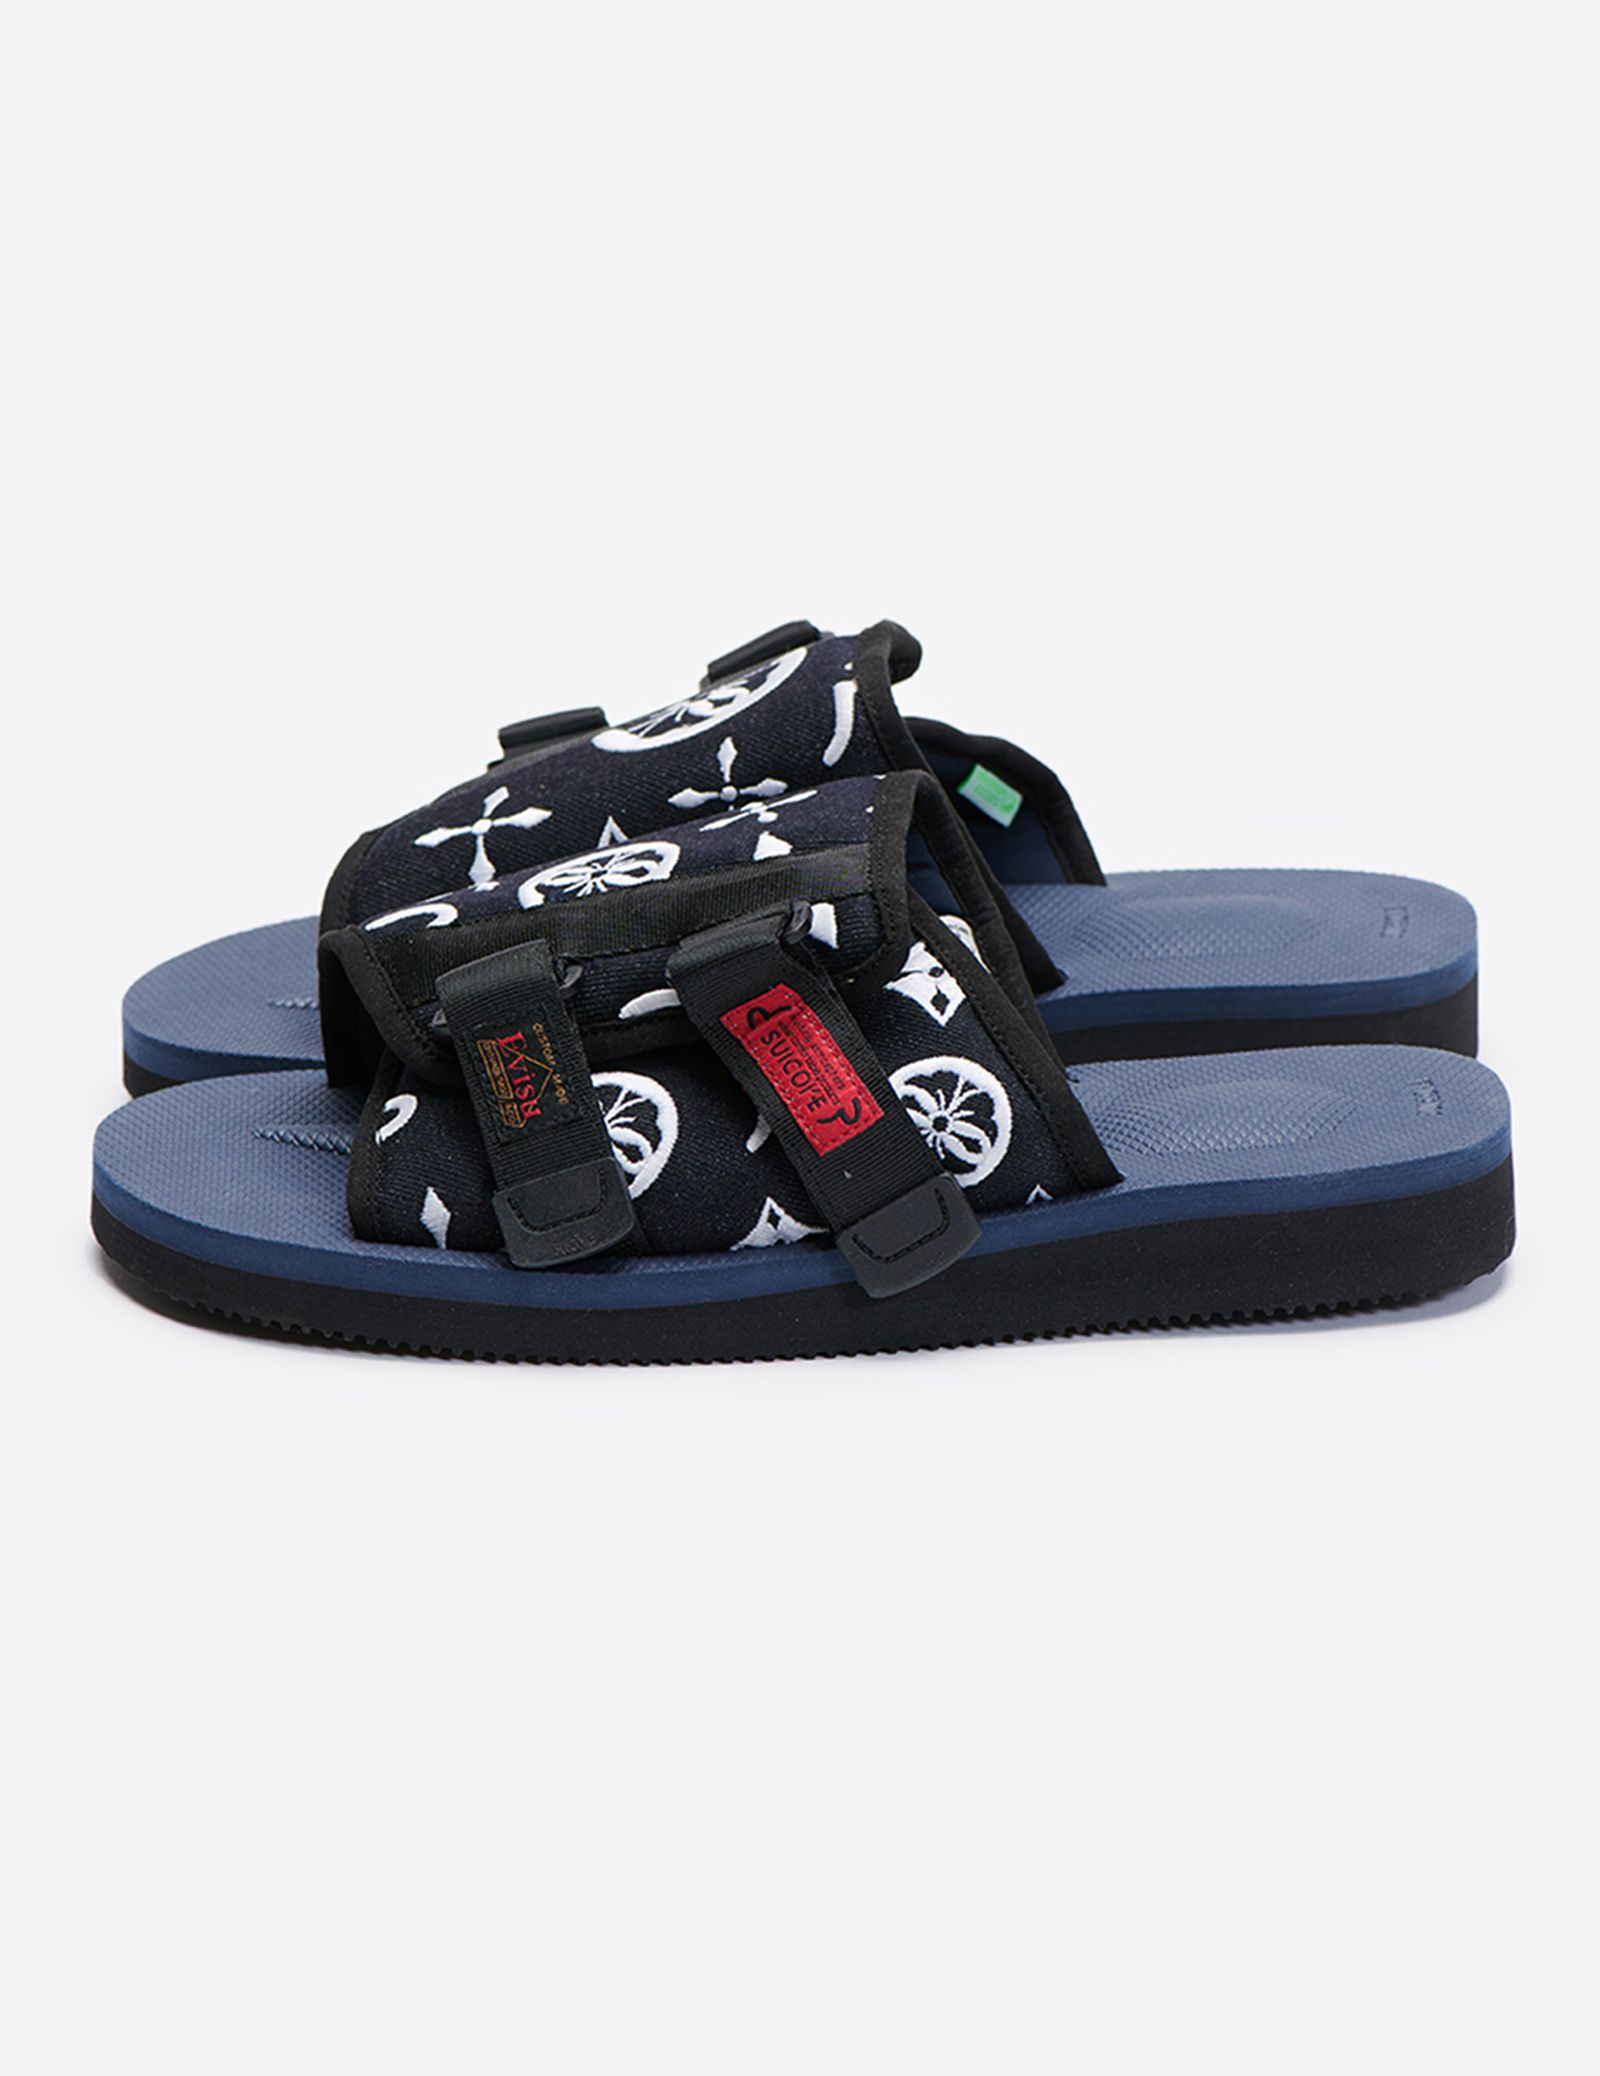 evisu-suicoke-denim-kaw-sandal-collab- (11)